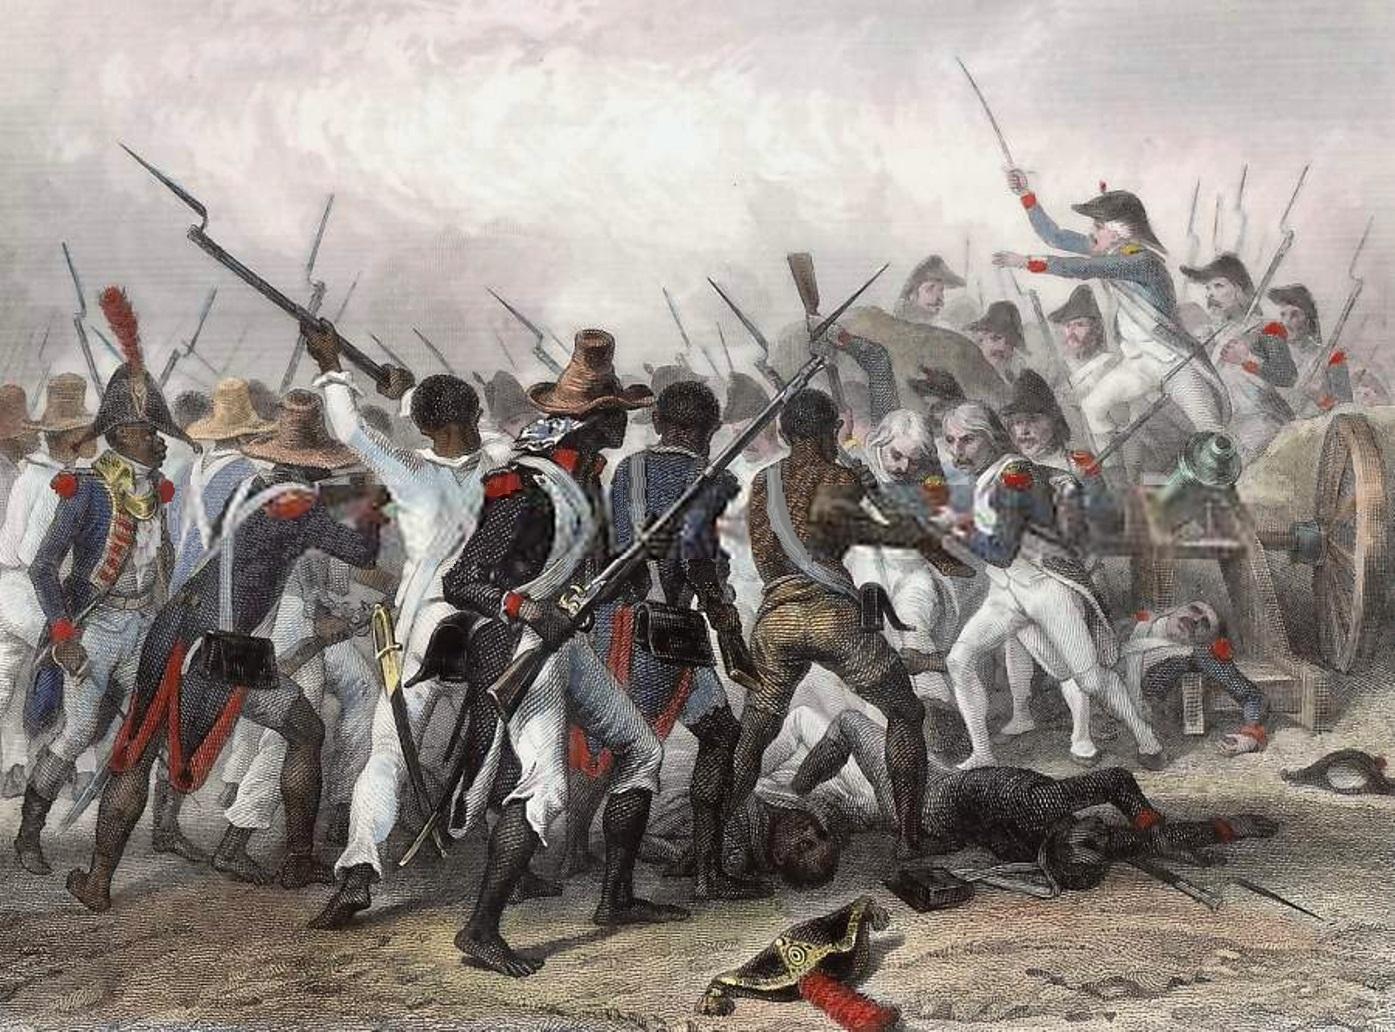 warfare history blog the an revolution slave revolts civil warfare history blog